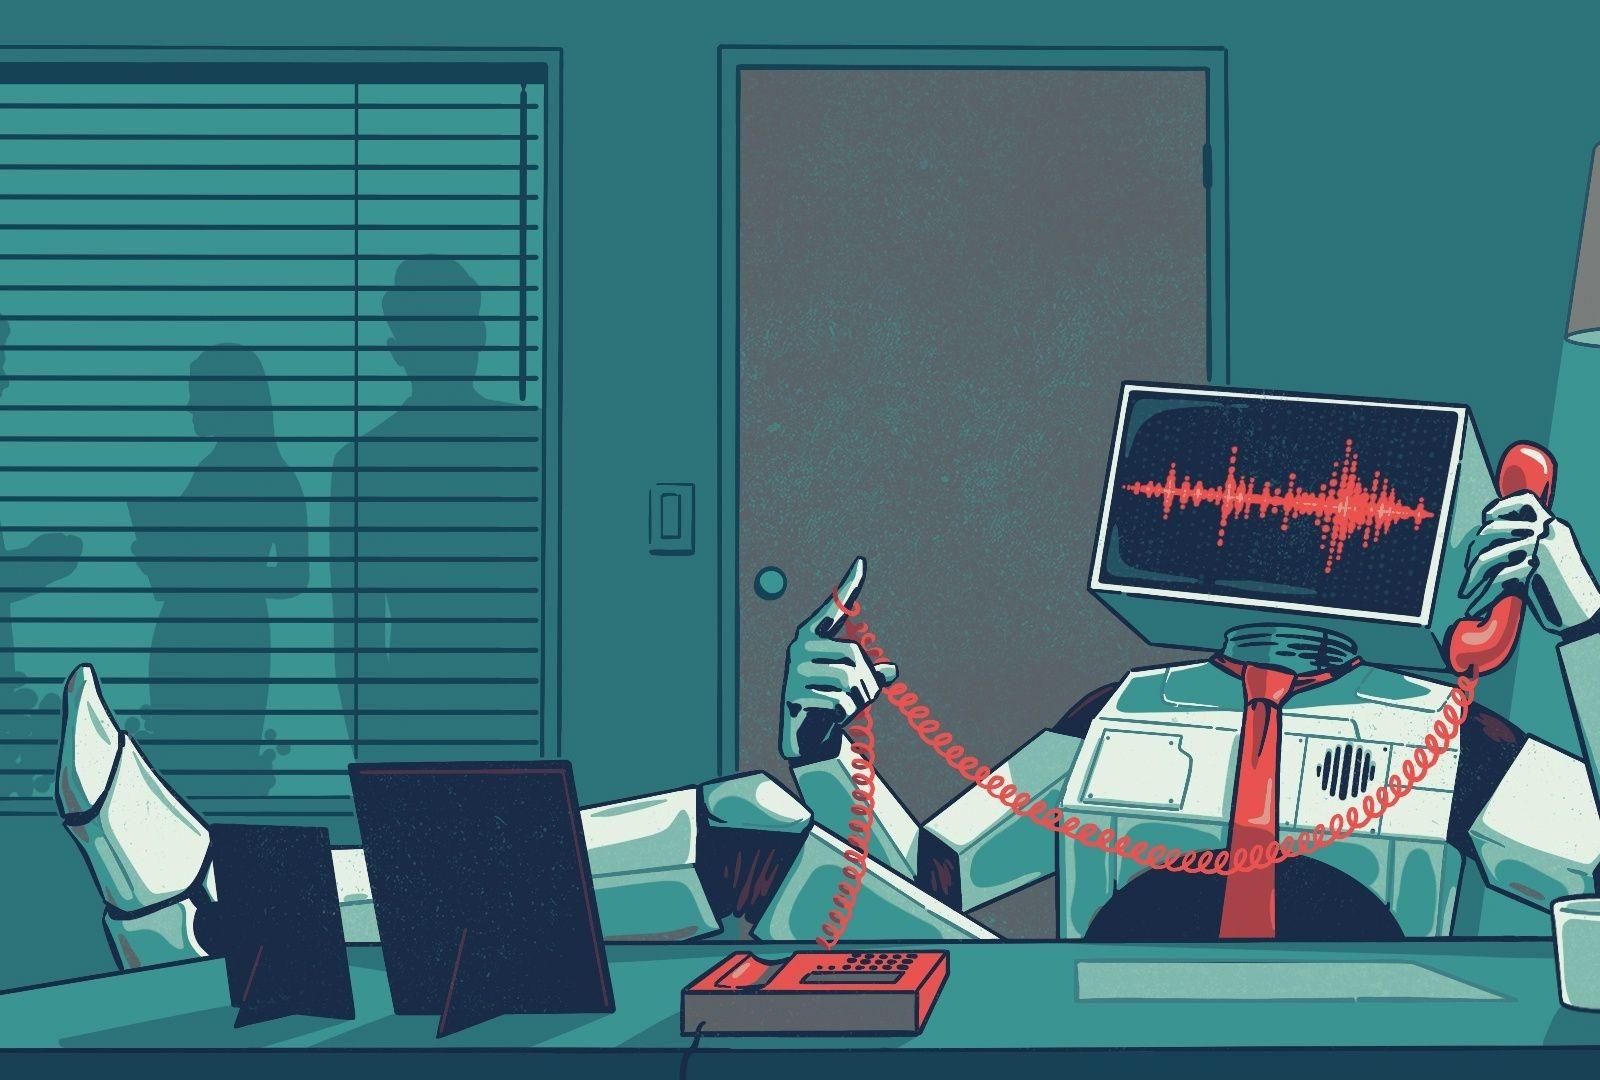 deepfake - deepfake ses - deepfake ses dolandırıcılığı - siber dolandırıcılık - siber güvenlik